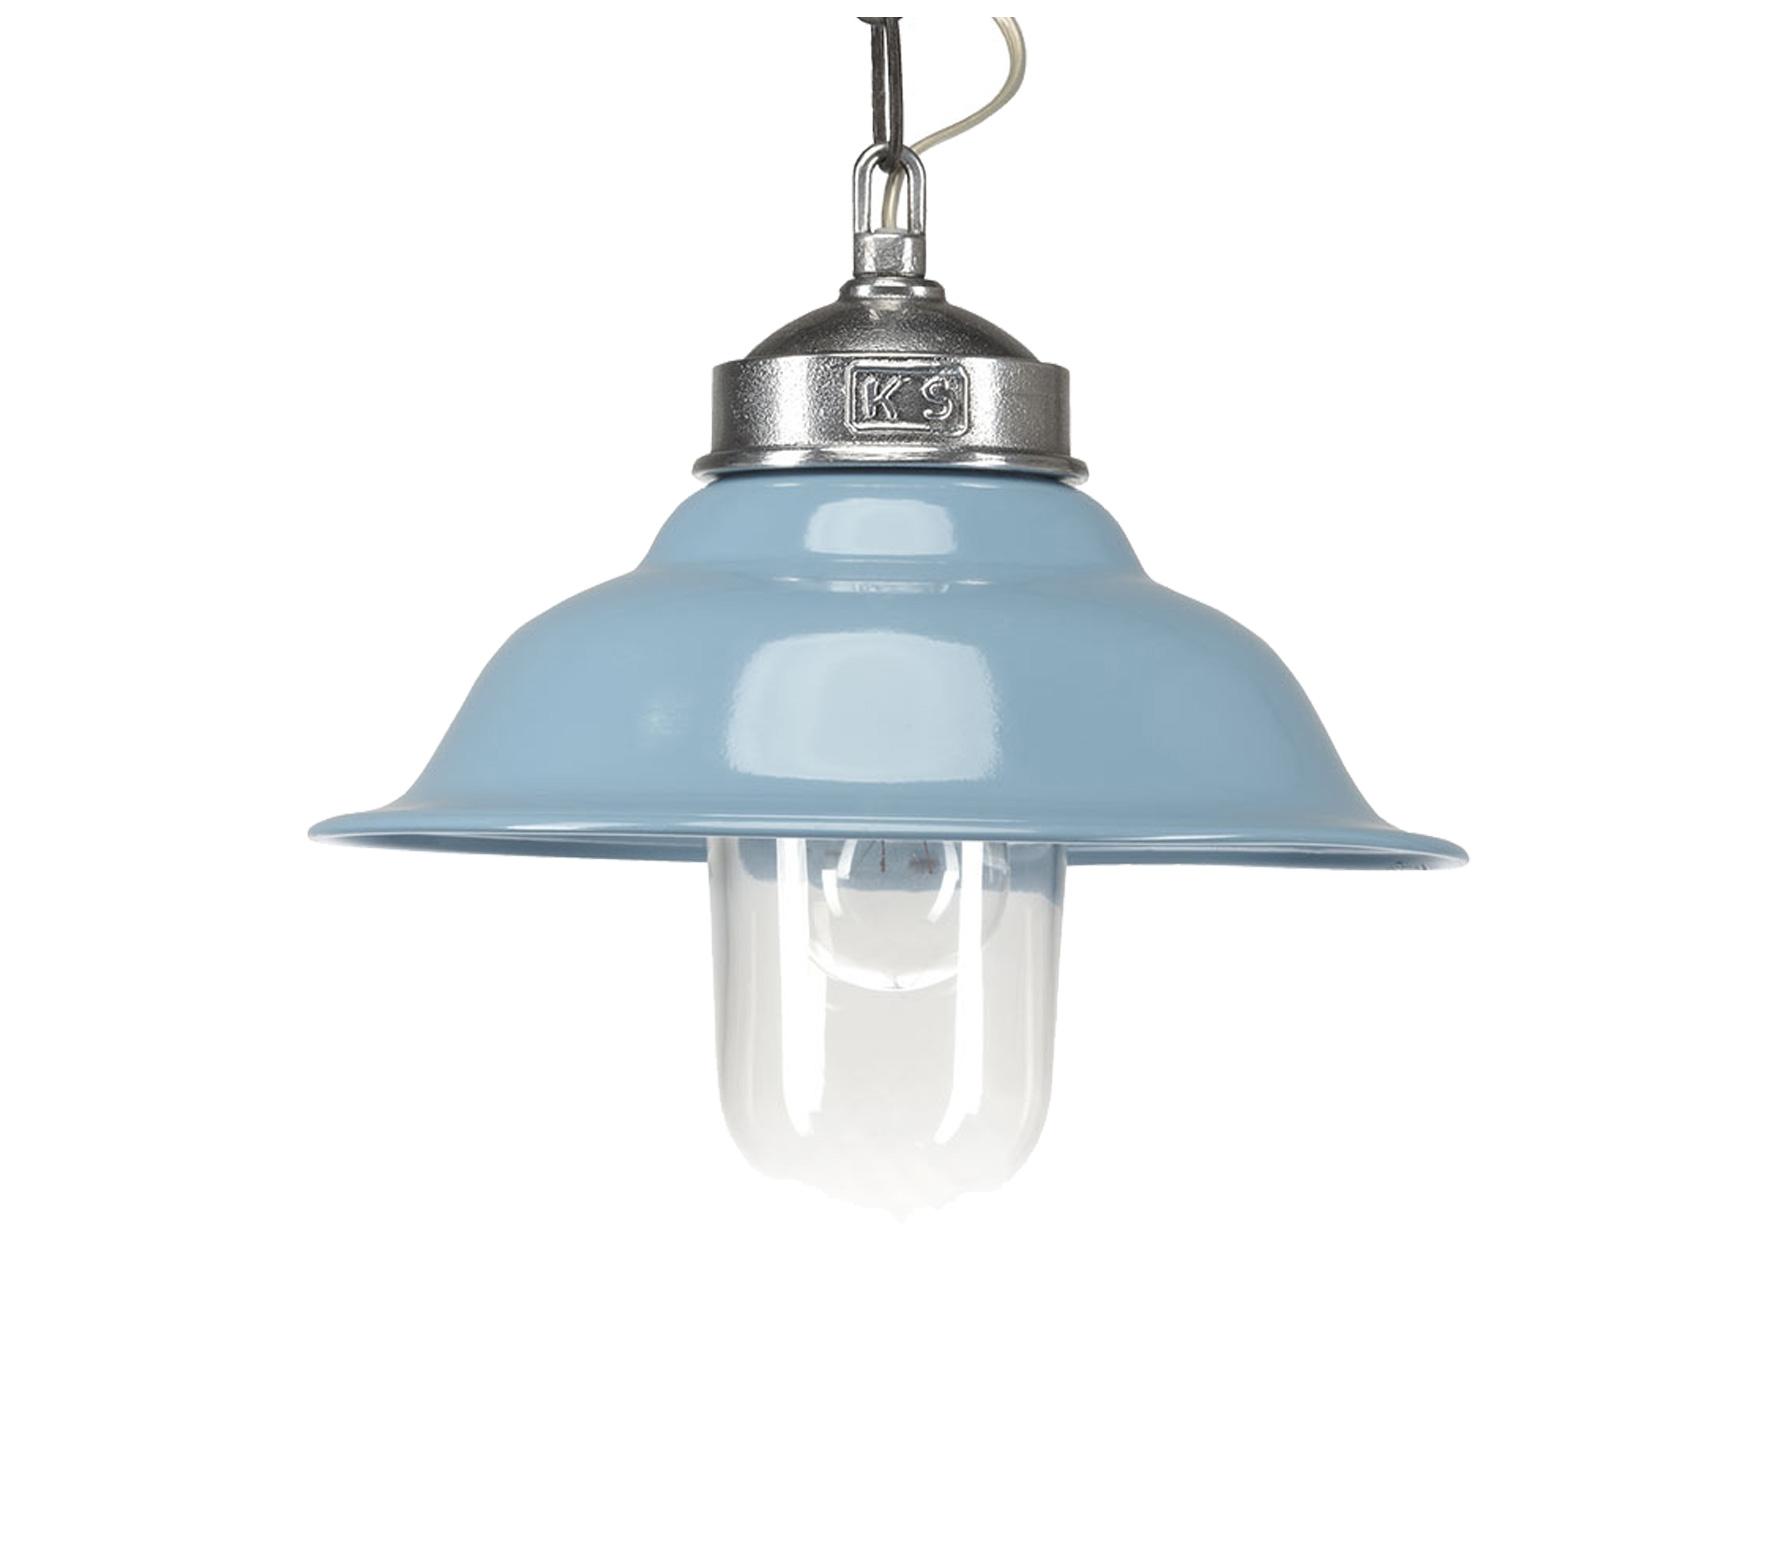 Porto Fino Retro hanglamp � 30�cm aluminium blauw Blauw